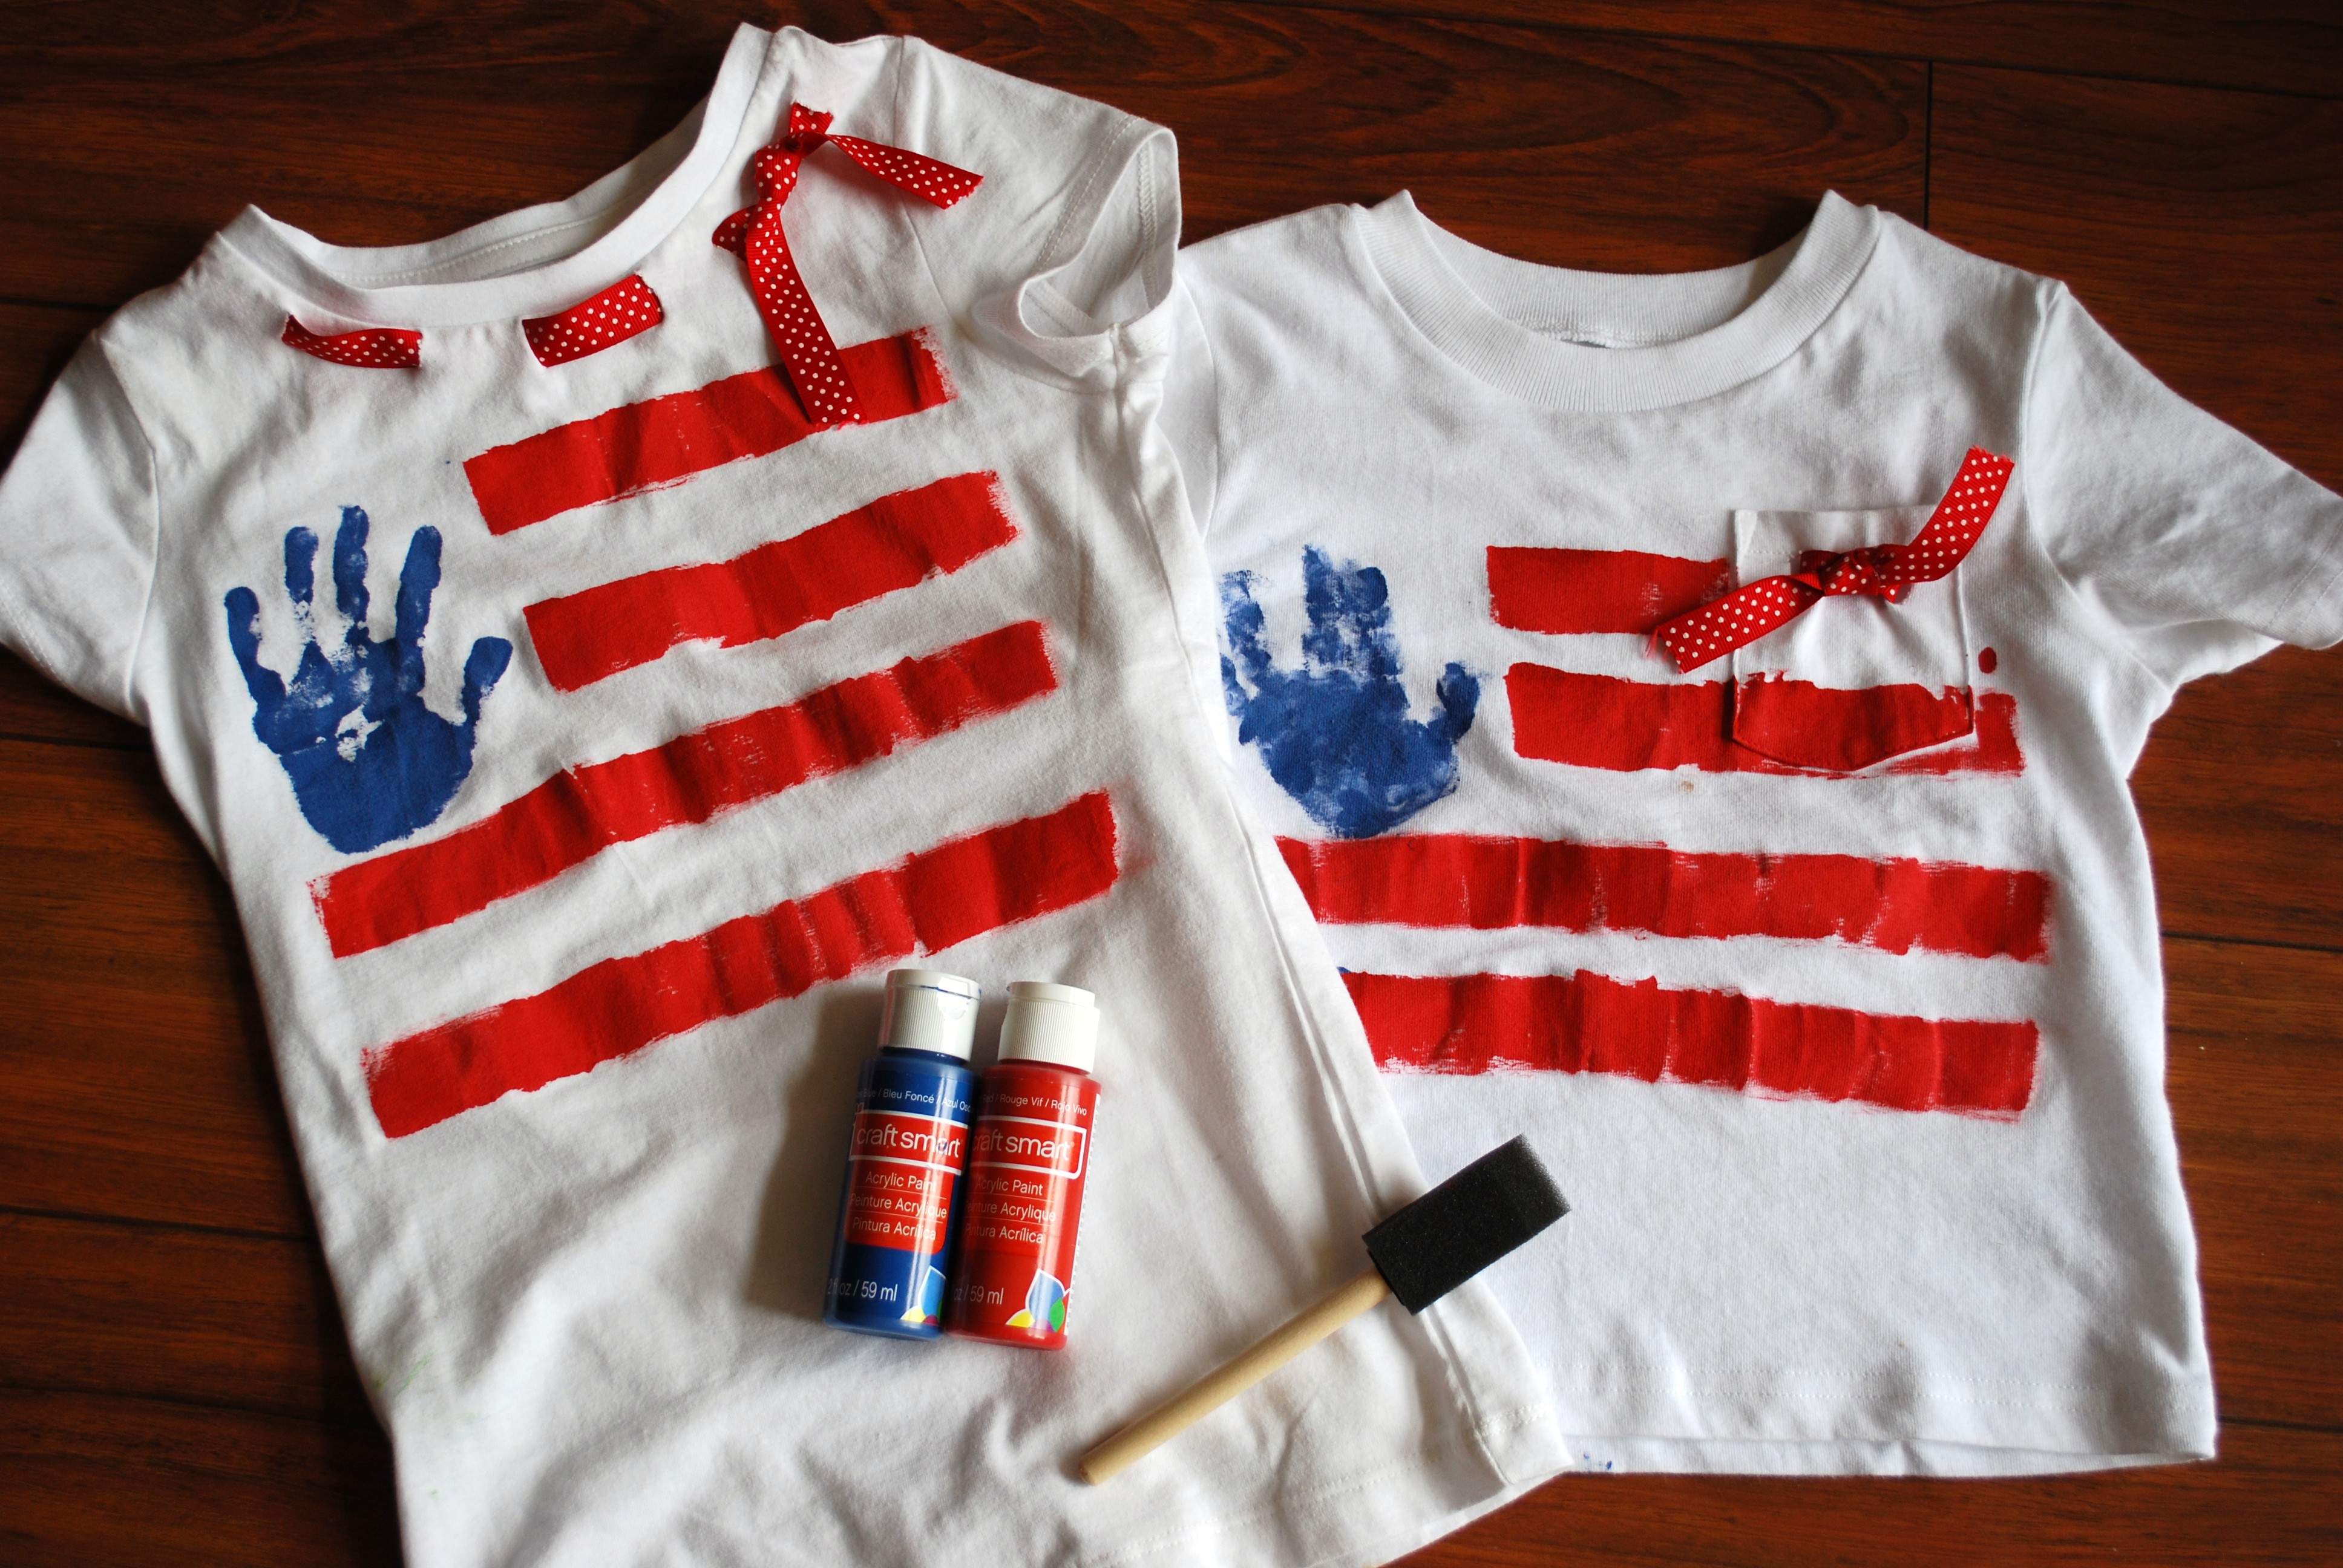 8478fae8 Quick Kid Craft: Patriotic T-shirts. | Make Myself at Home